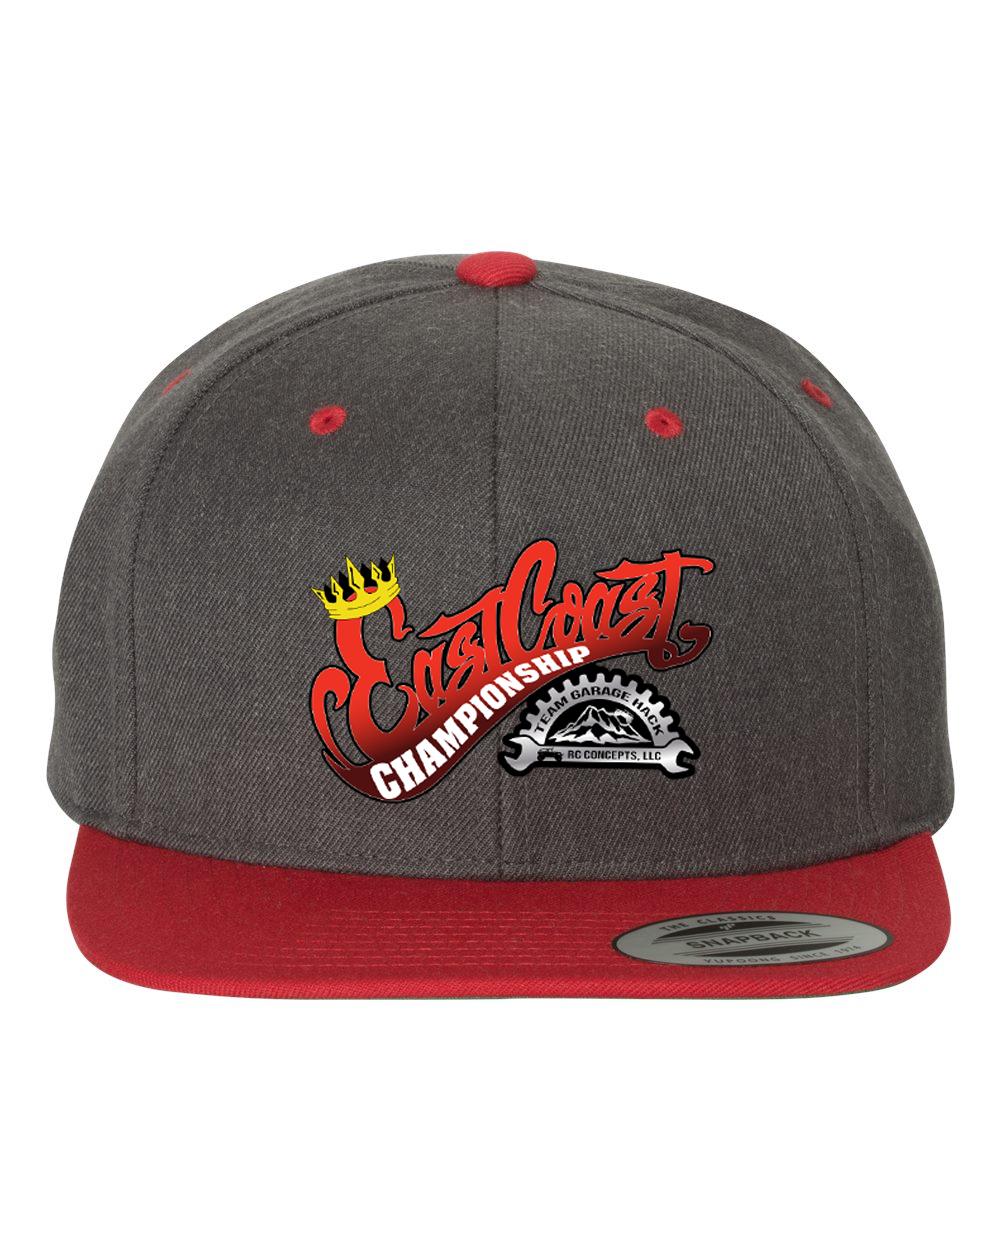 2021 ECC Snapback Flatbill Hat